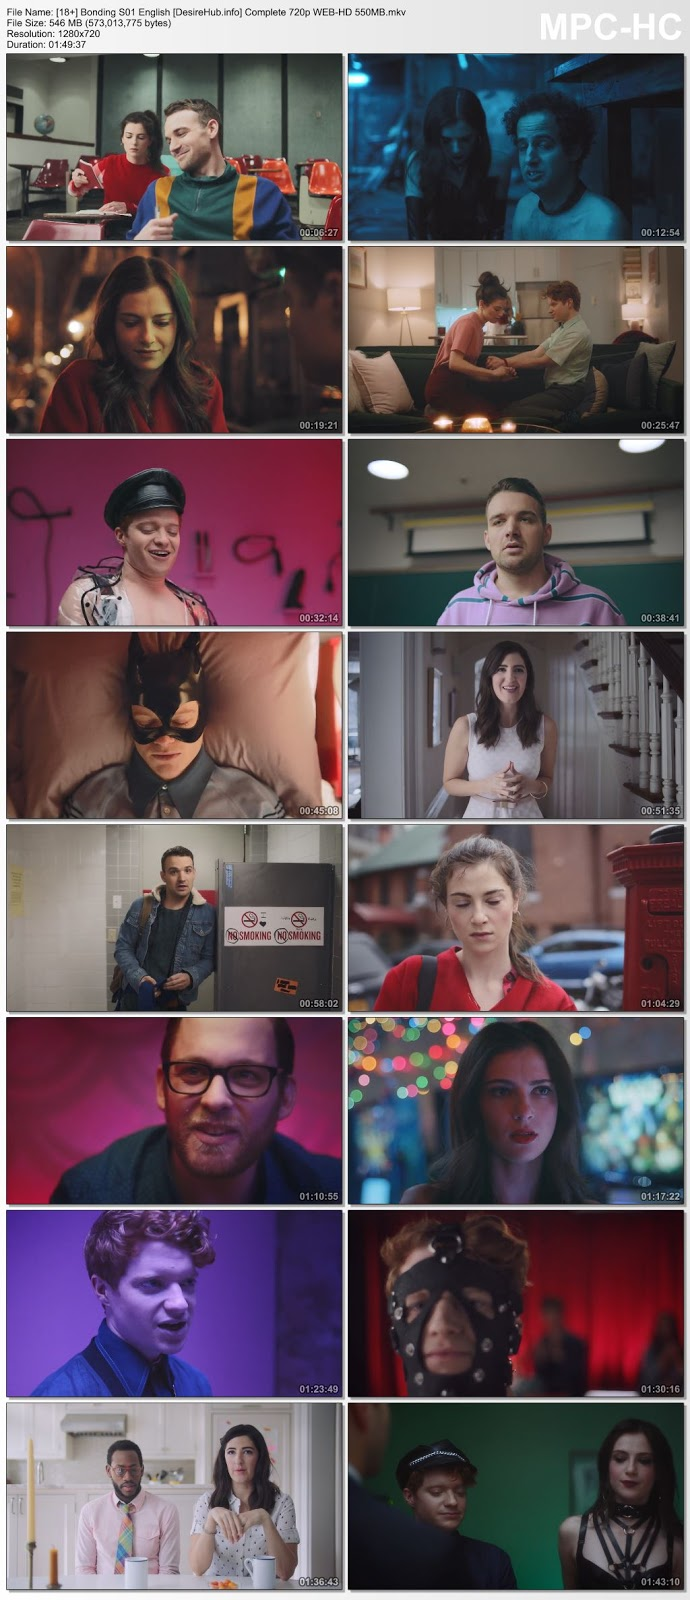 [18+] Bonding S01 English Complete WEB Series 720p WEB-HD 550MB Desirehub